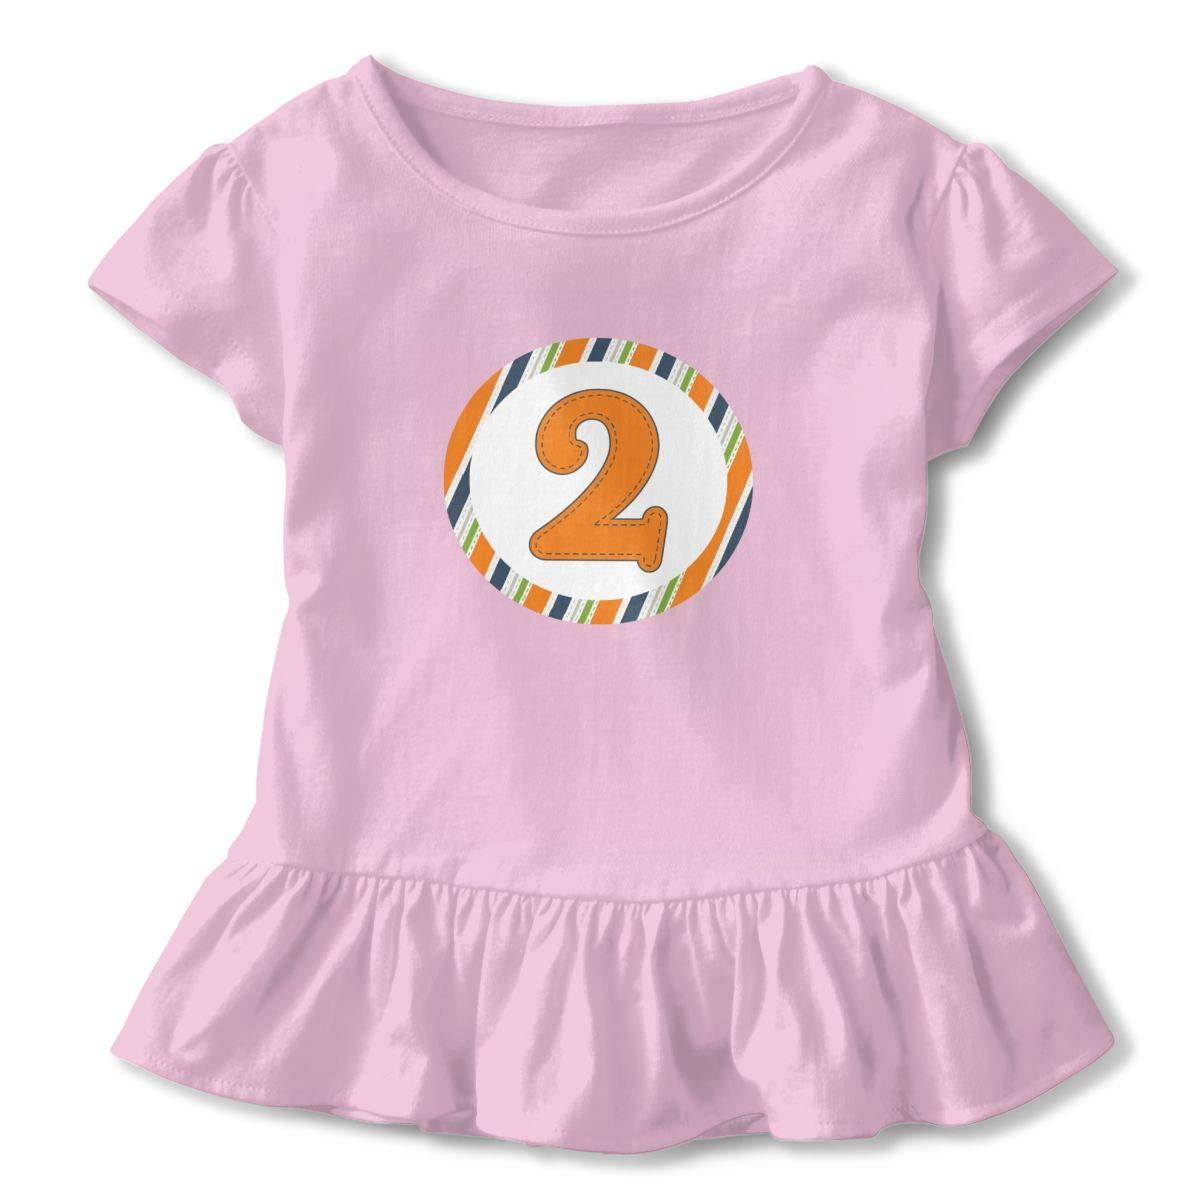 CZnuen 2nd Birthday 2-6T Baby Girls Cotton Jersey Short Sleeve Ruffle Tee